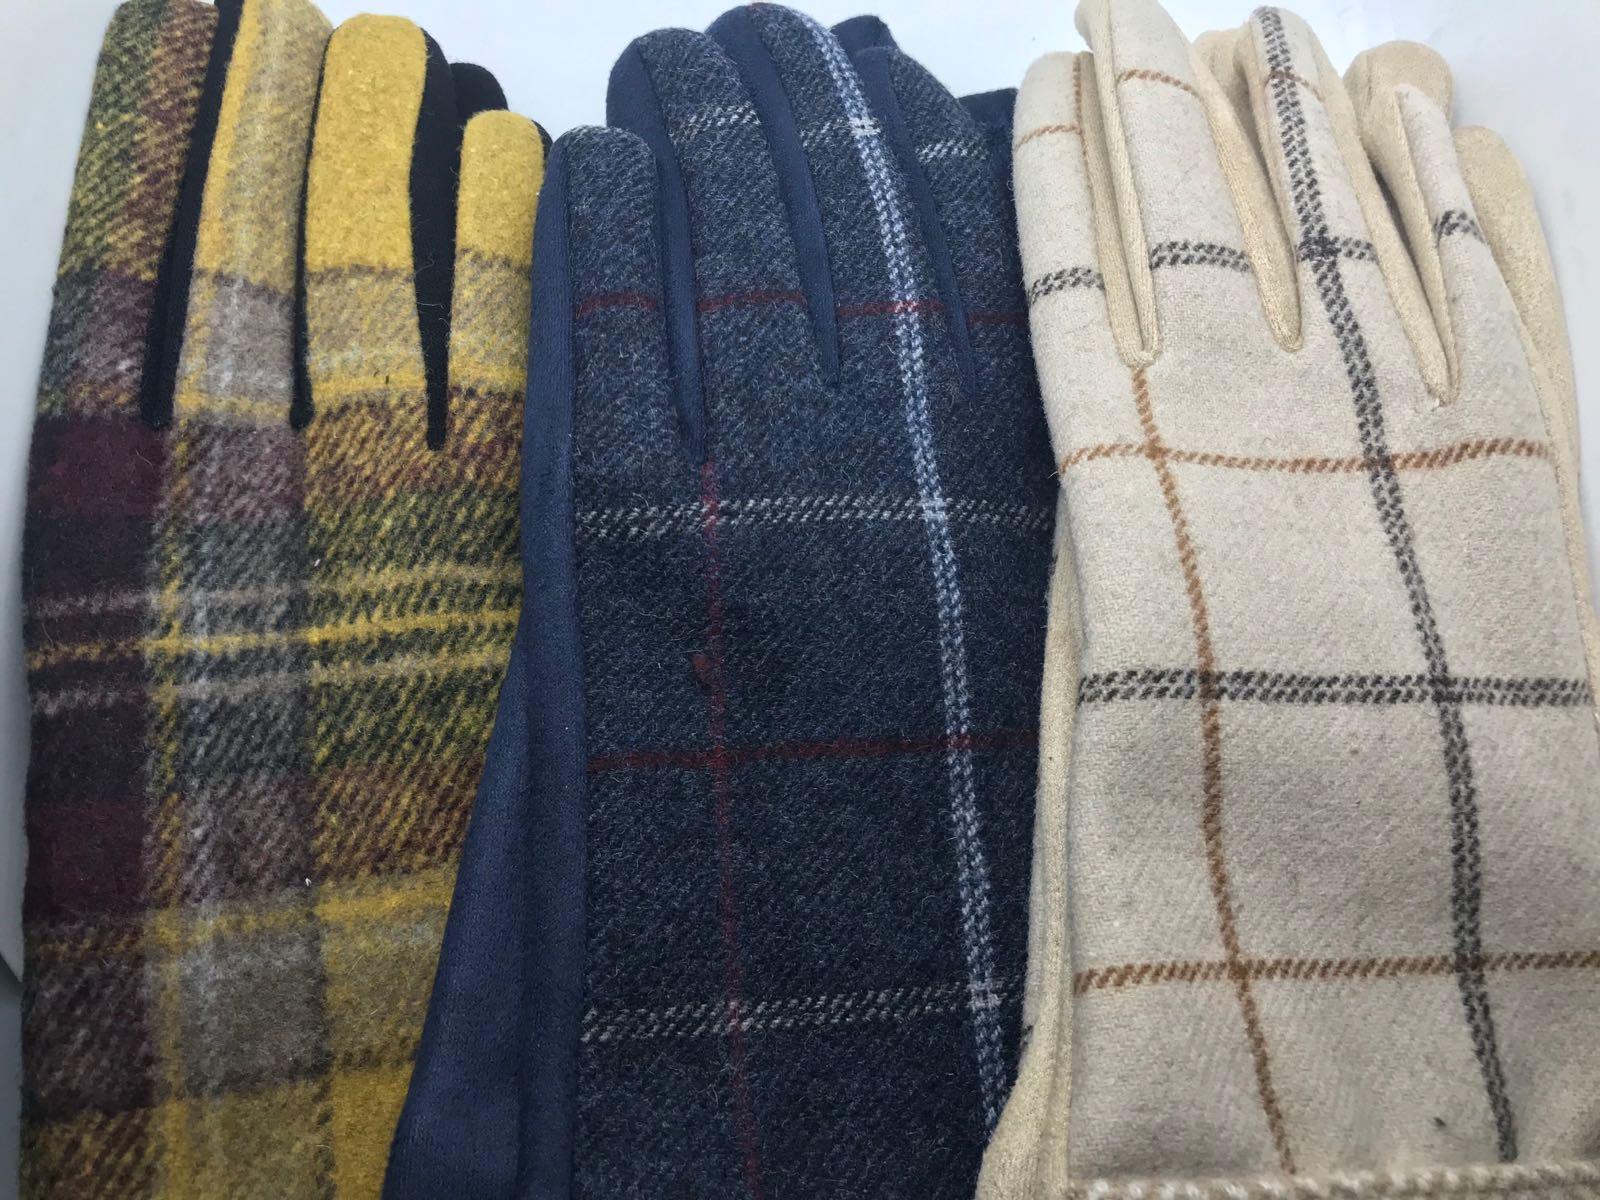 Msh check patterned gloves